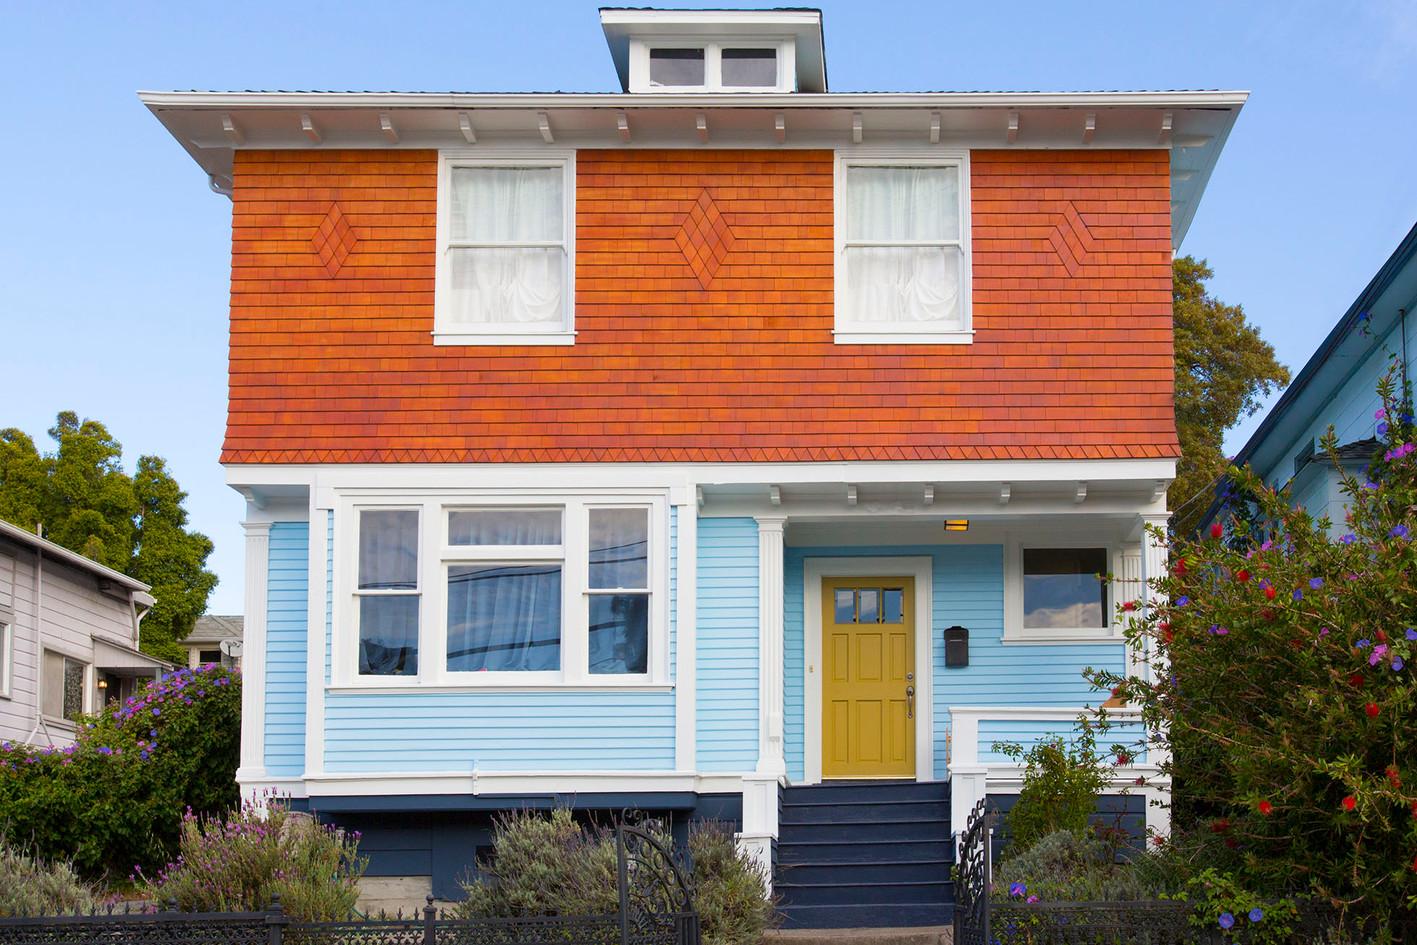 Casa Cedar Front 02 - cleaned up.jpg